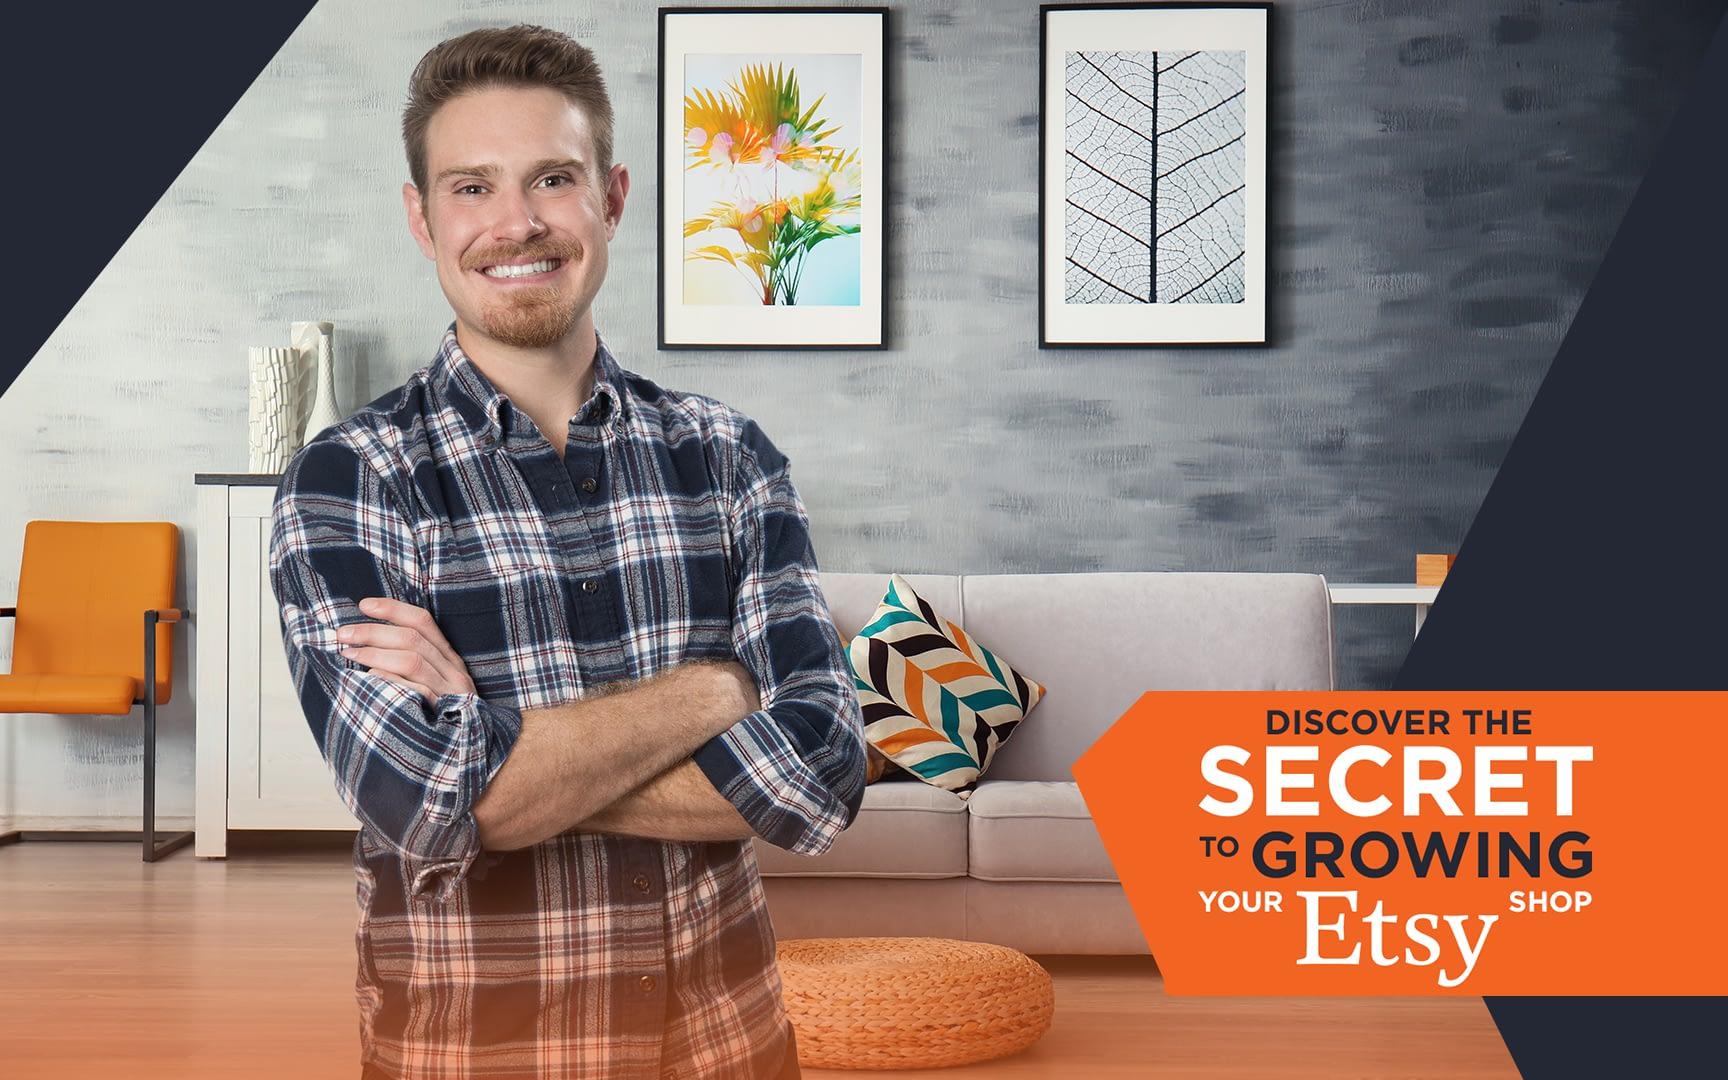 The Secret to growing your etsy shop webinars